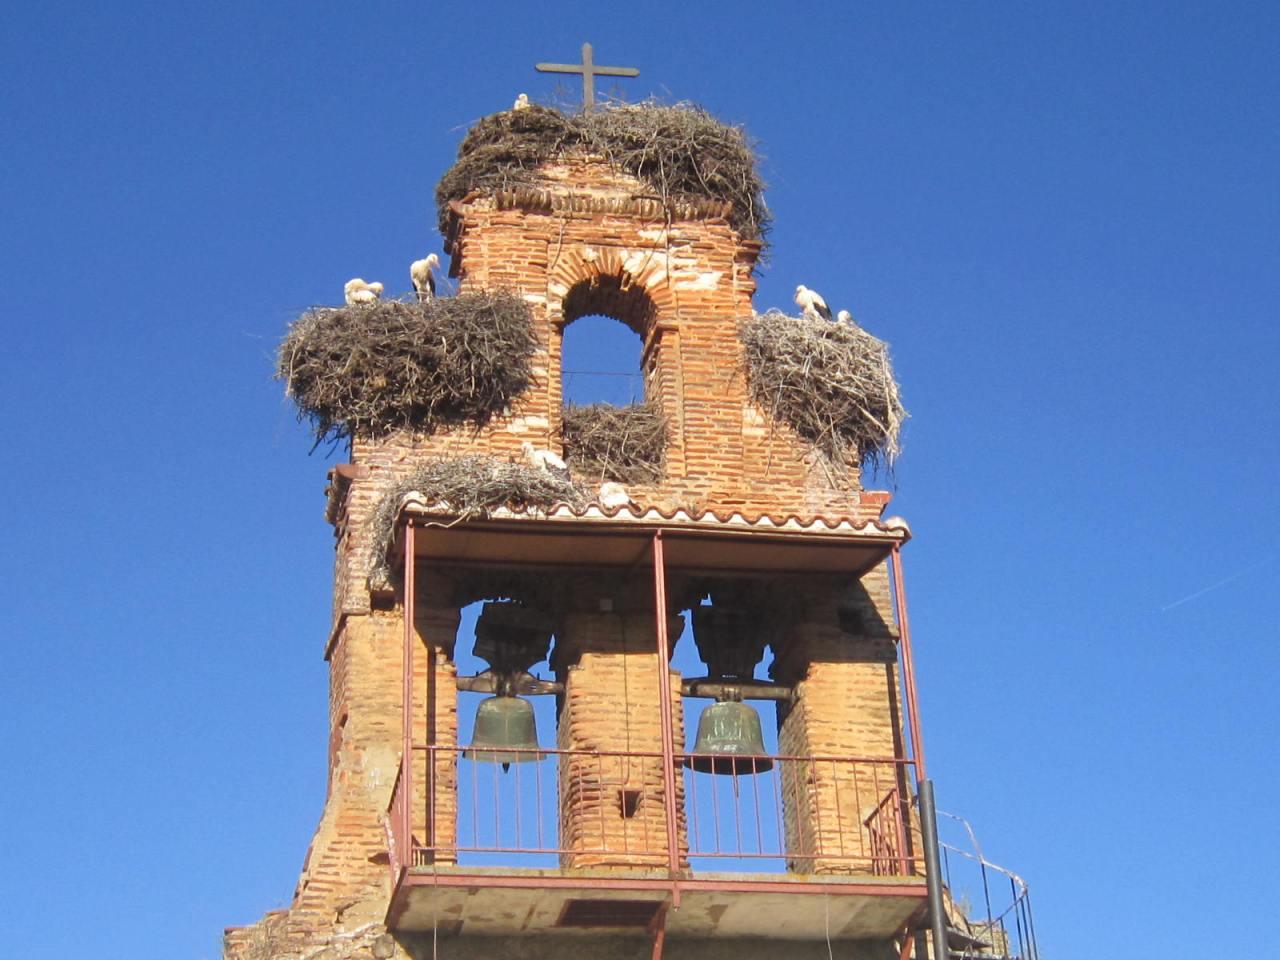 Between Leon and Hospital de Orbigo